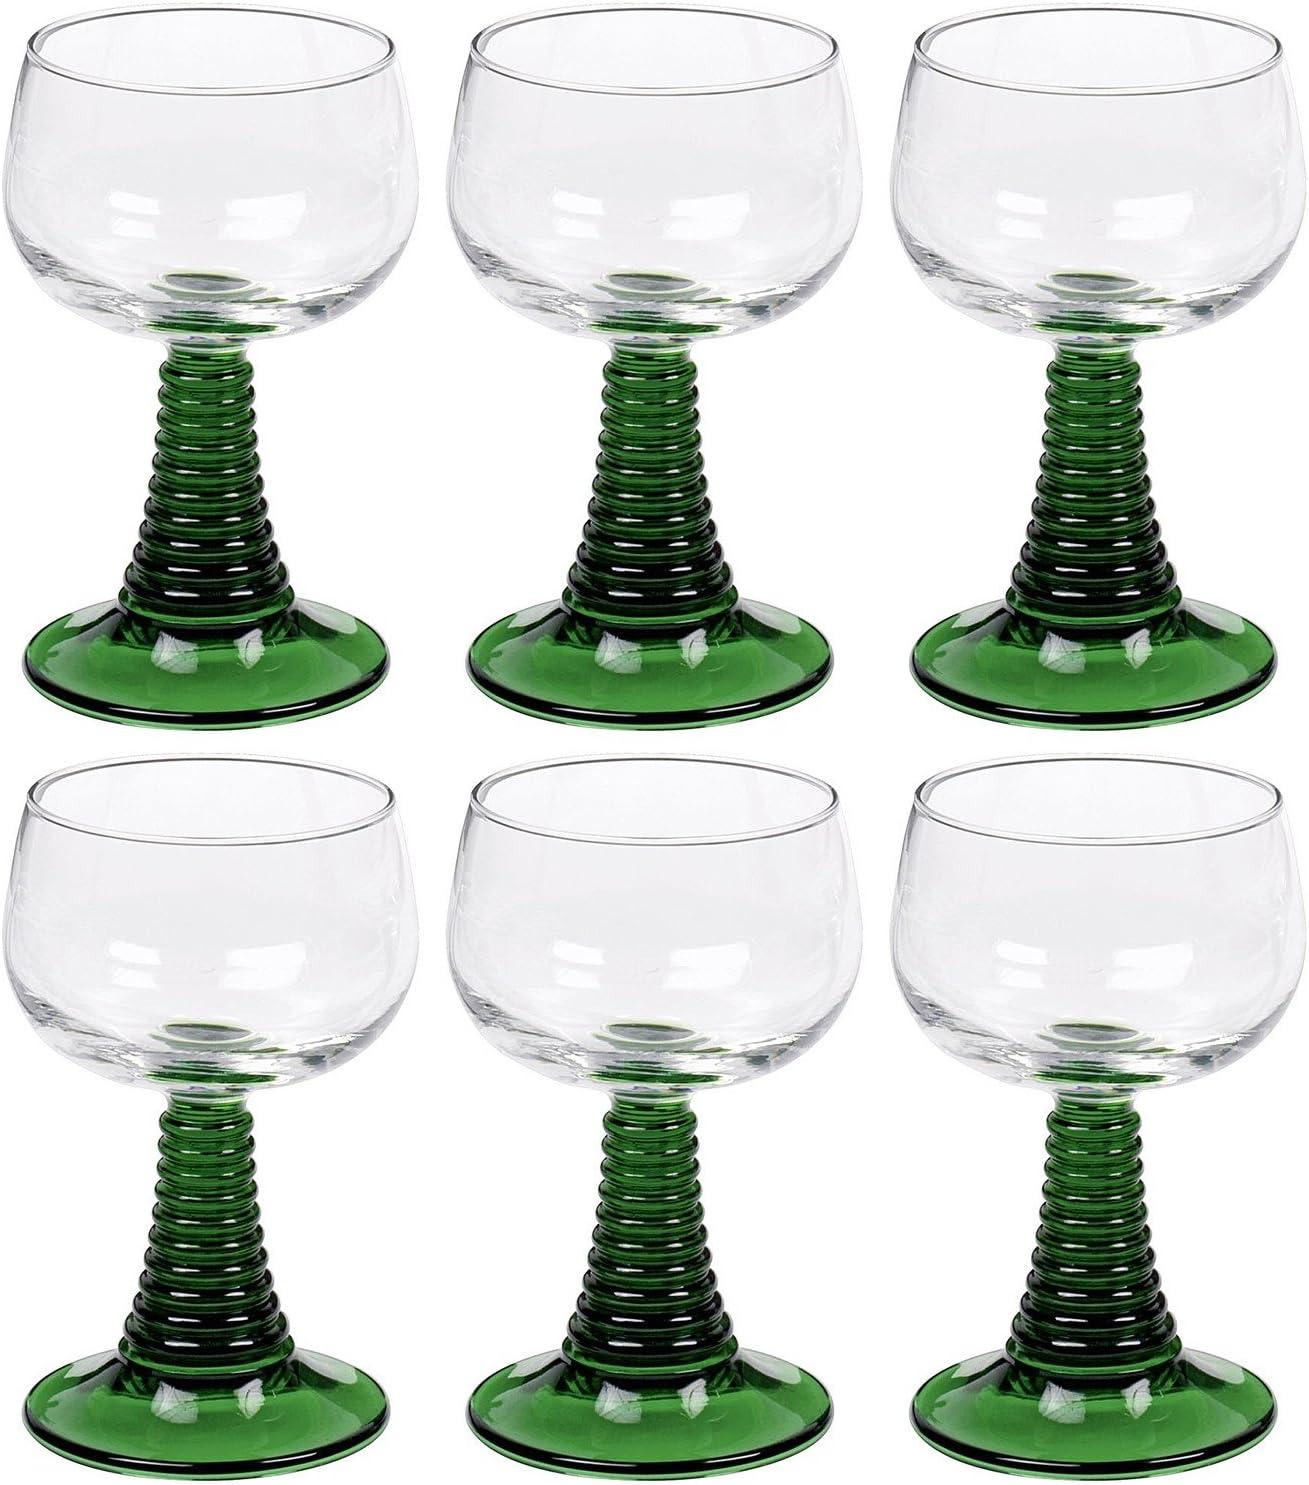 6 R/ömer R/ömergl/äser Gr/ün Weingl/äser Wein Gl/äser Glas 27 cl 0,2 L Geeicht